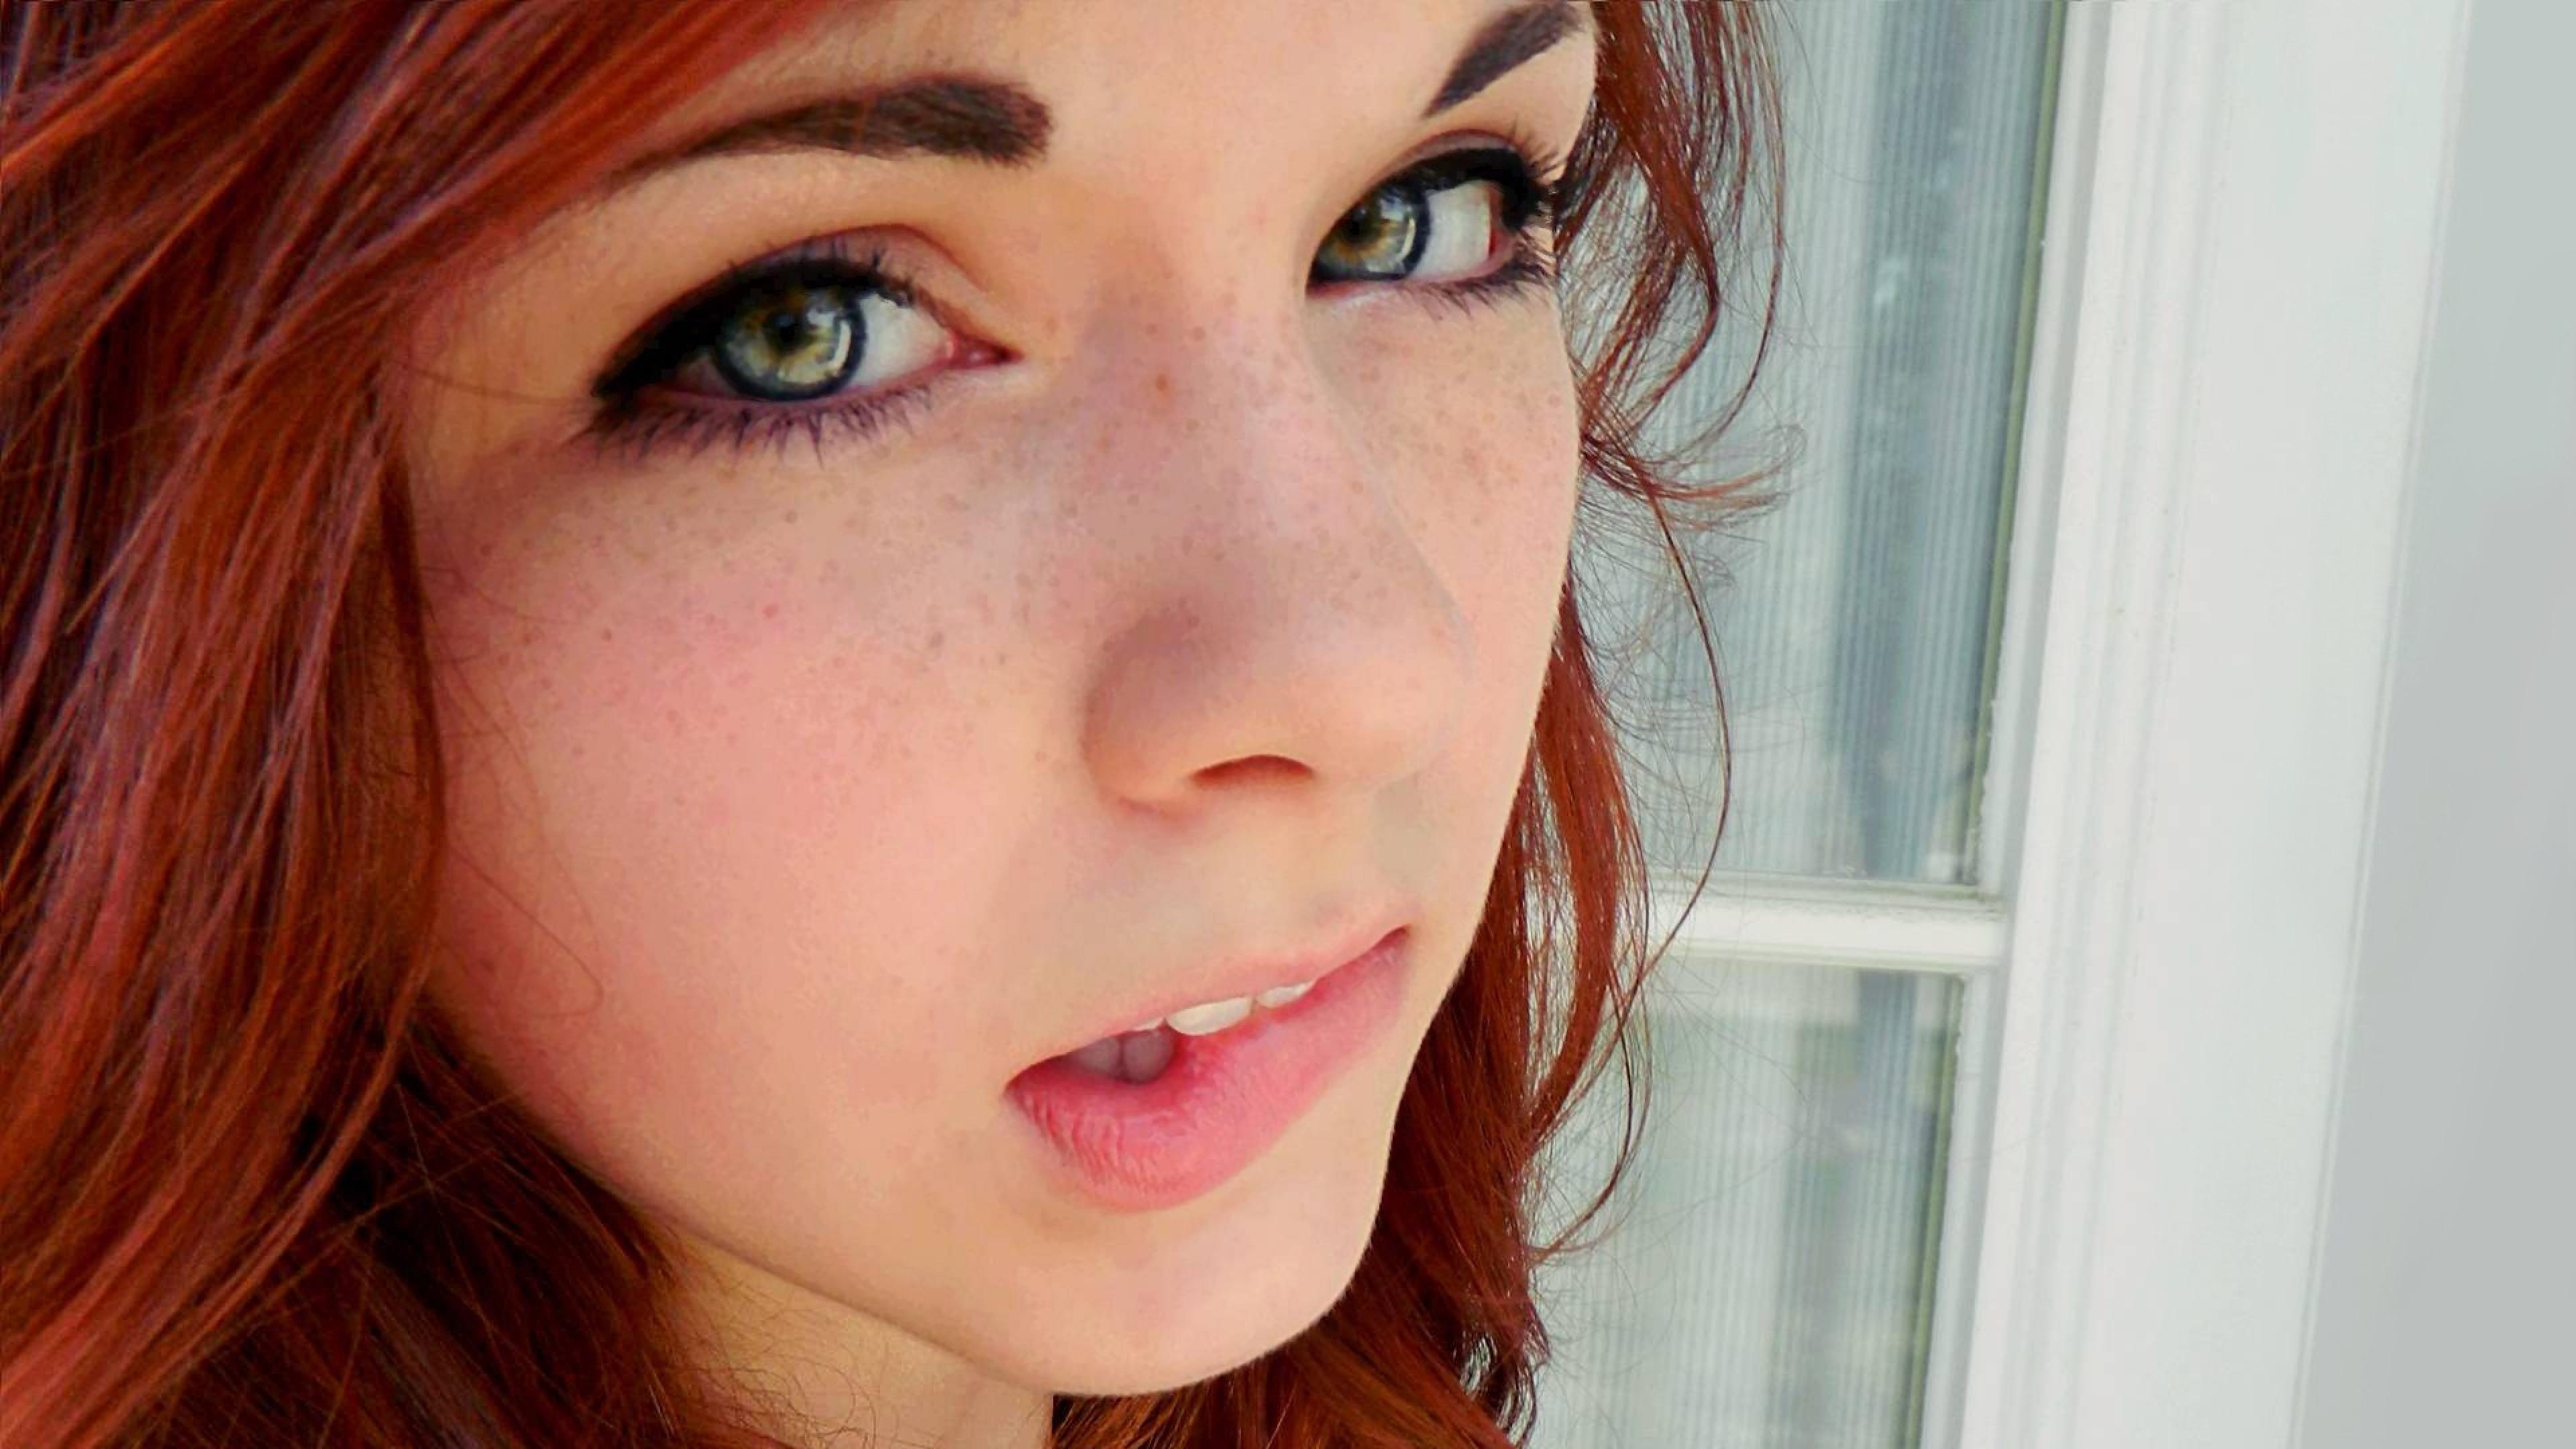 3840x2160 Wallpaper green-eyed, girl, eyes, face